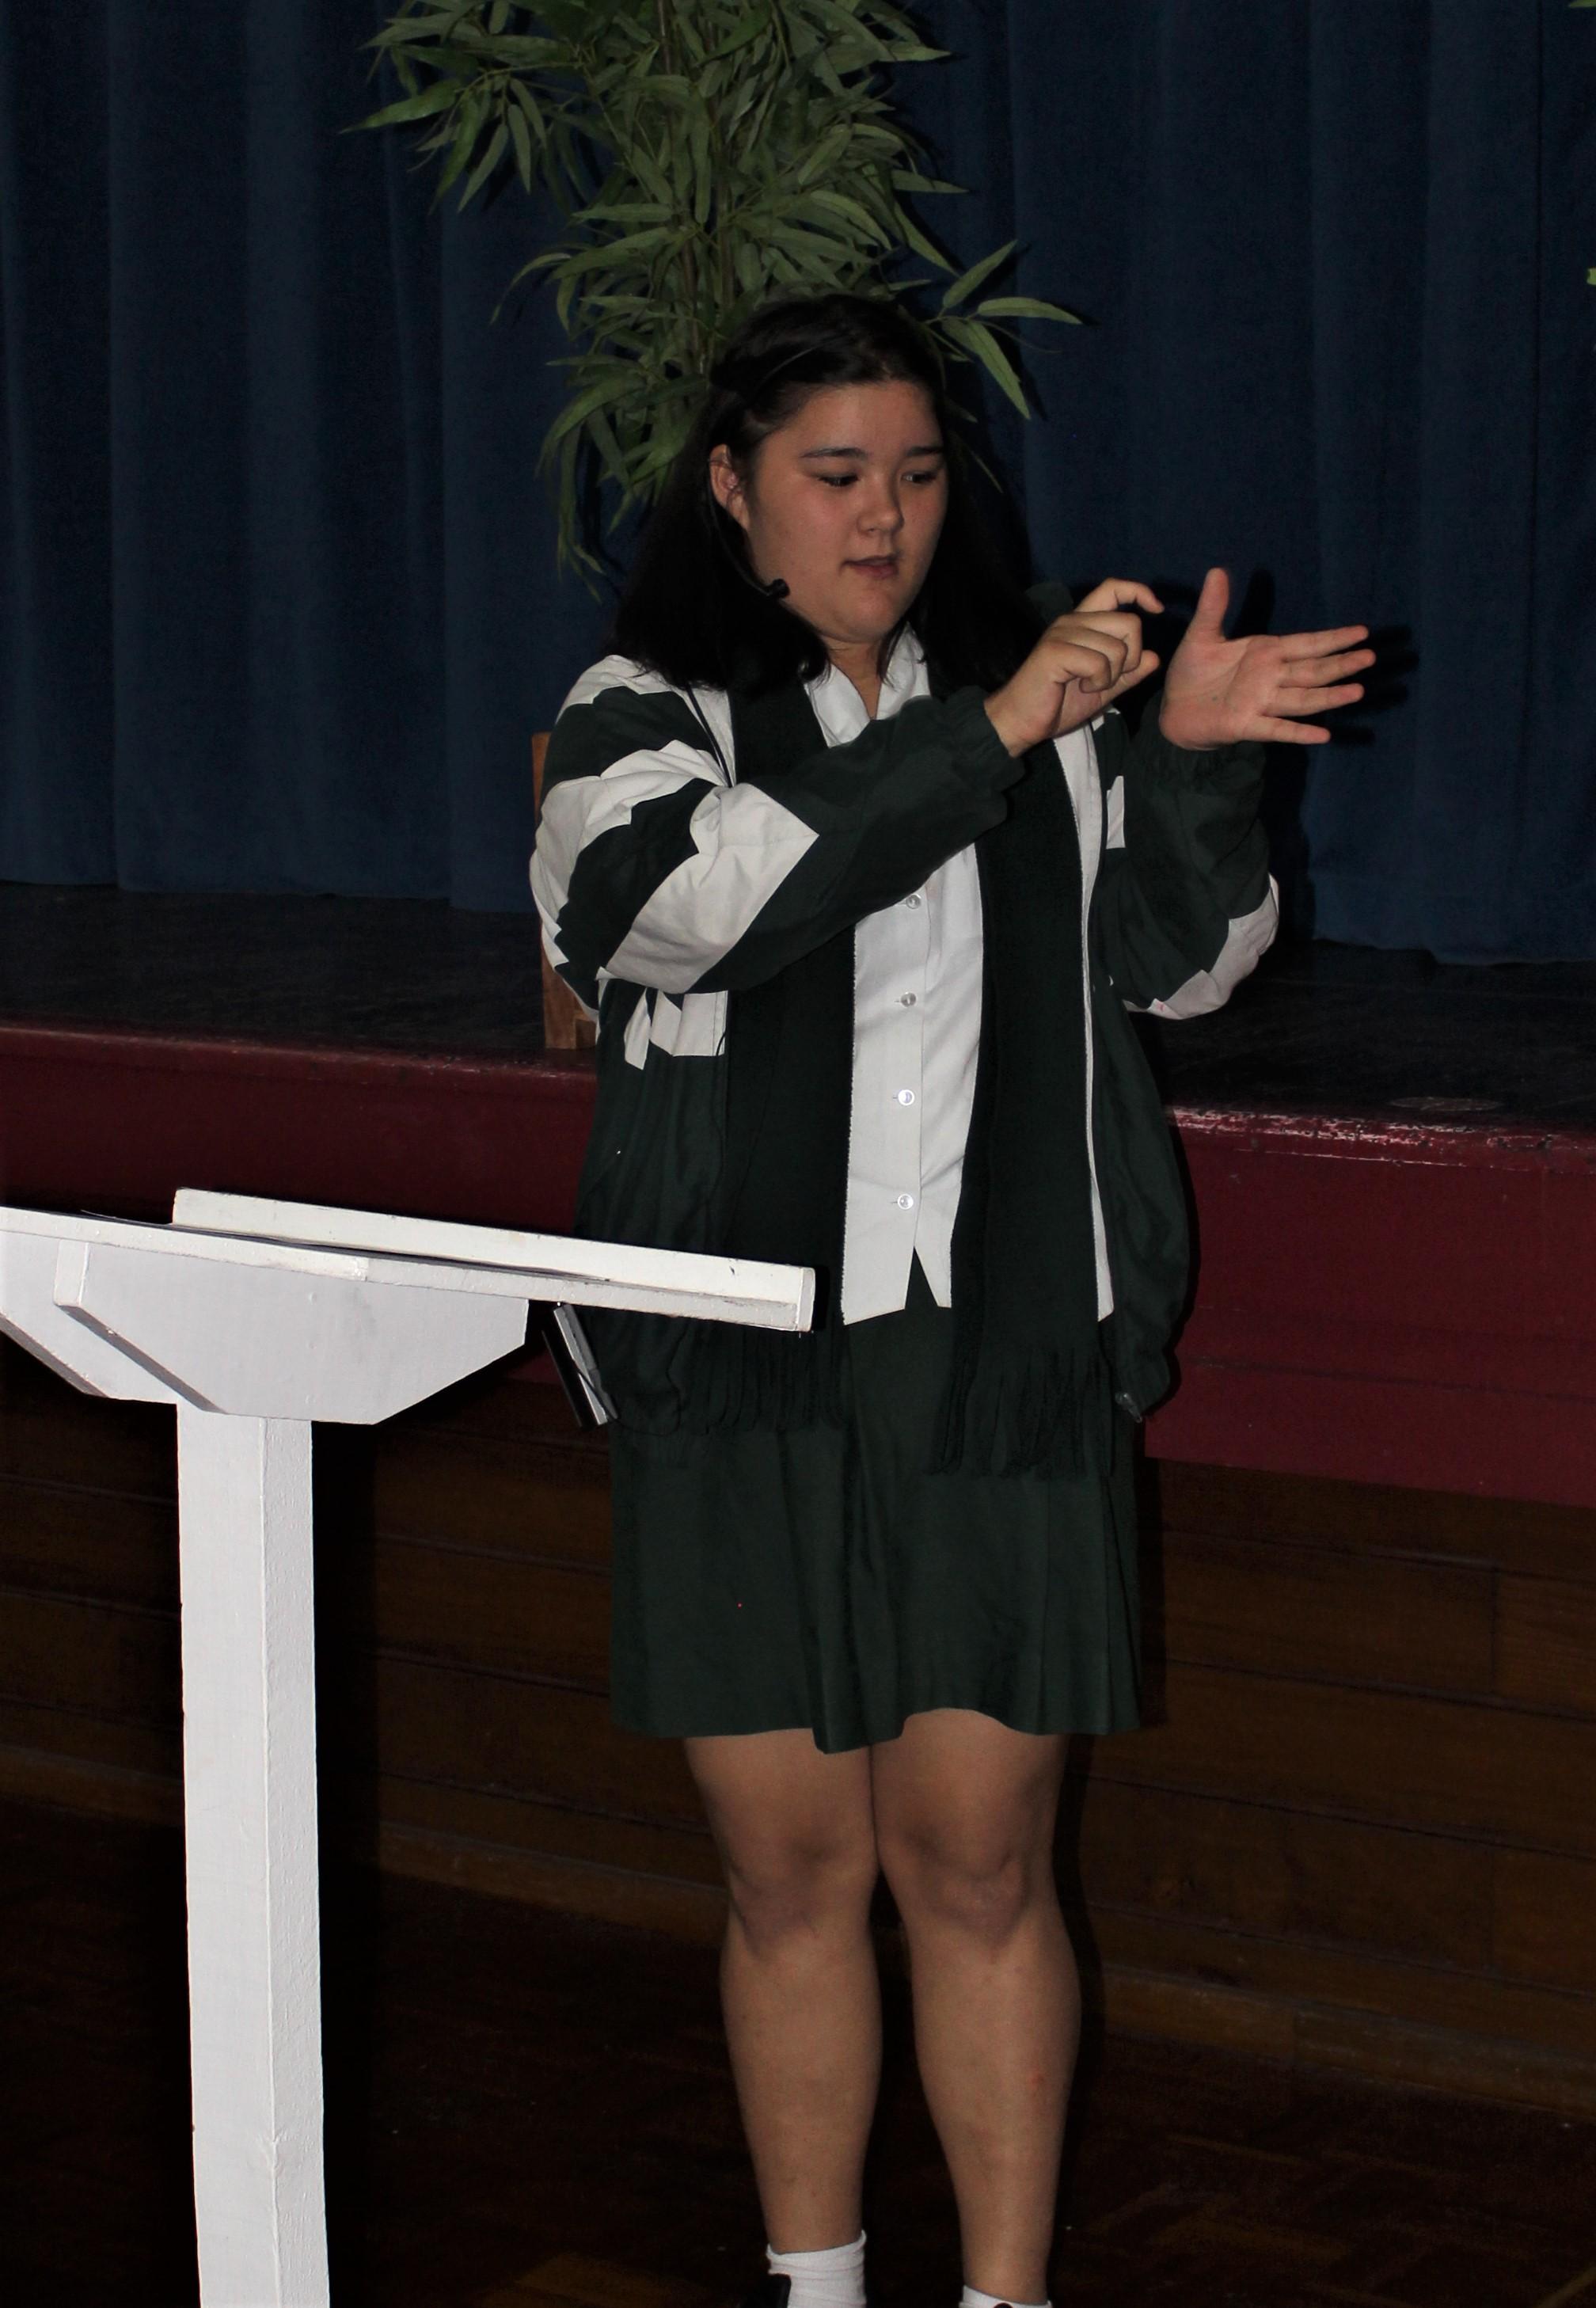 13 Contestant 7 Using Sign Language.JPG